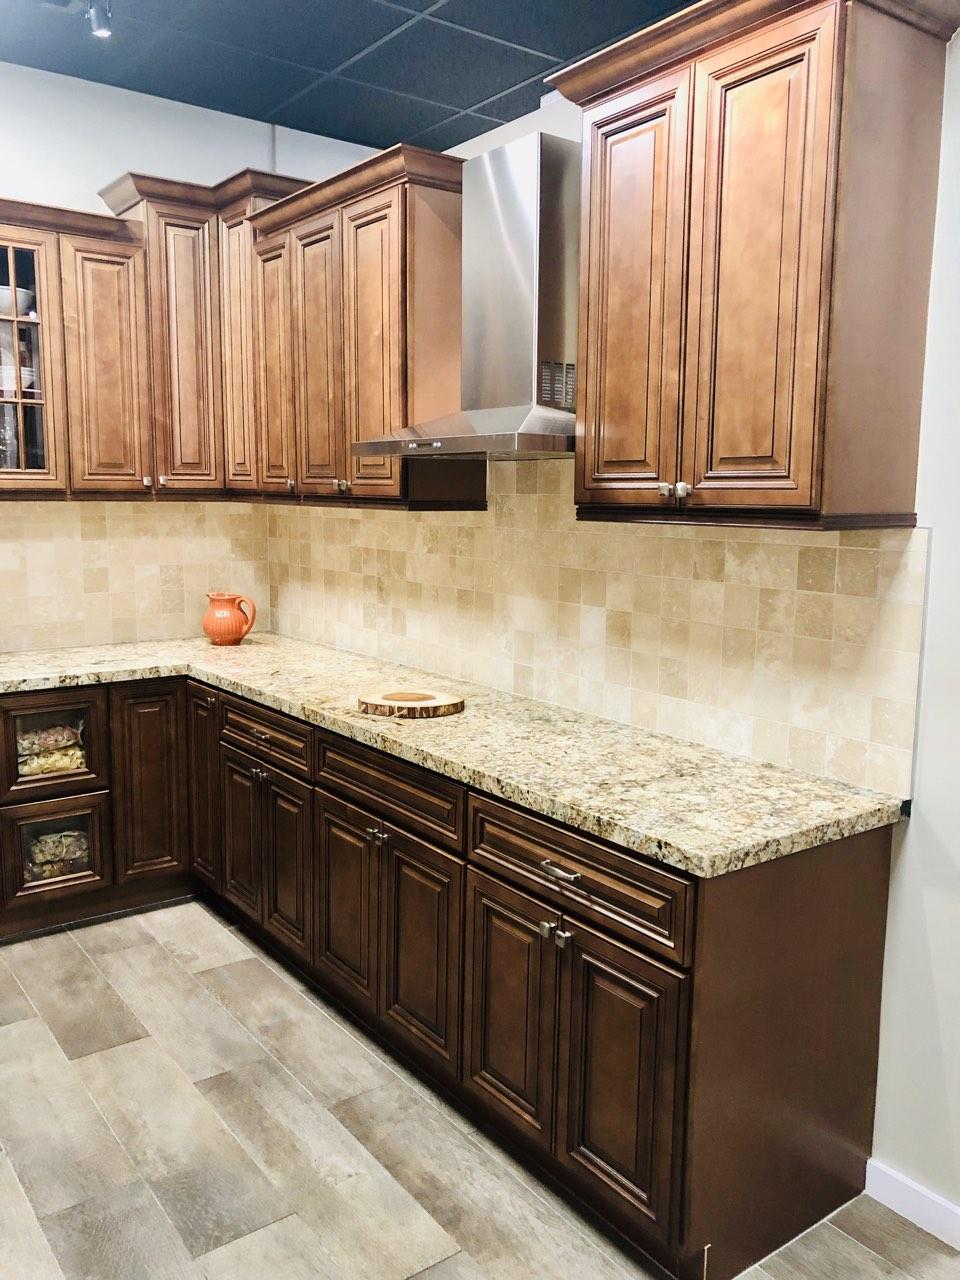 Revive Cabinet Closet Pro (Everett, Washington)